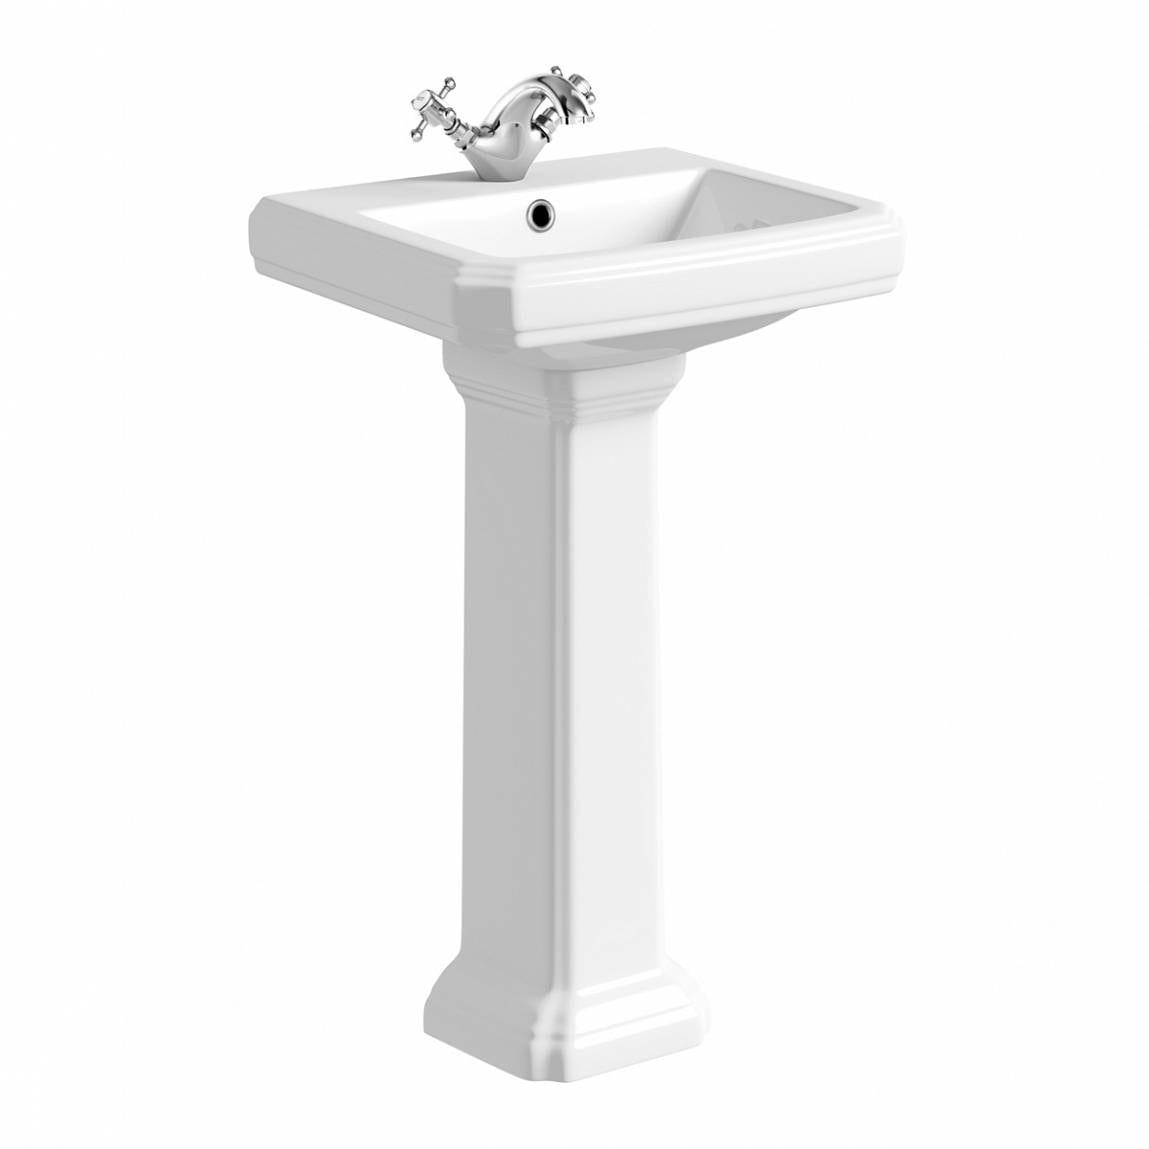 The Bath Co. Dulwich 1 tap hole full pedestal basin 500mm